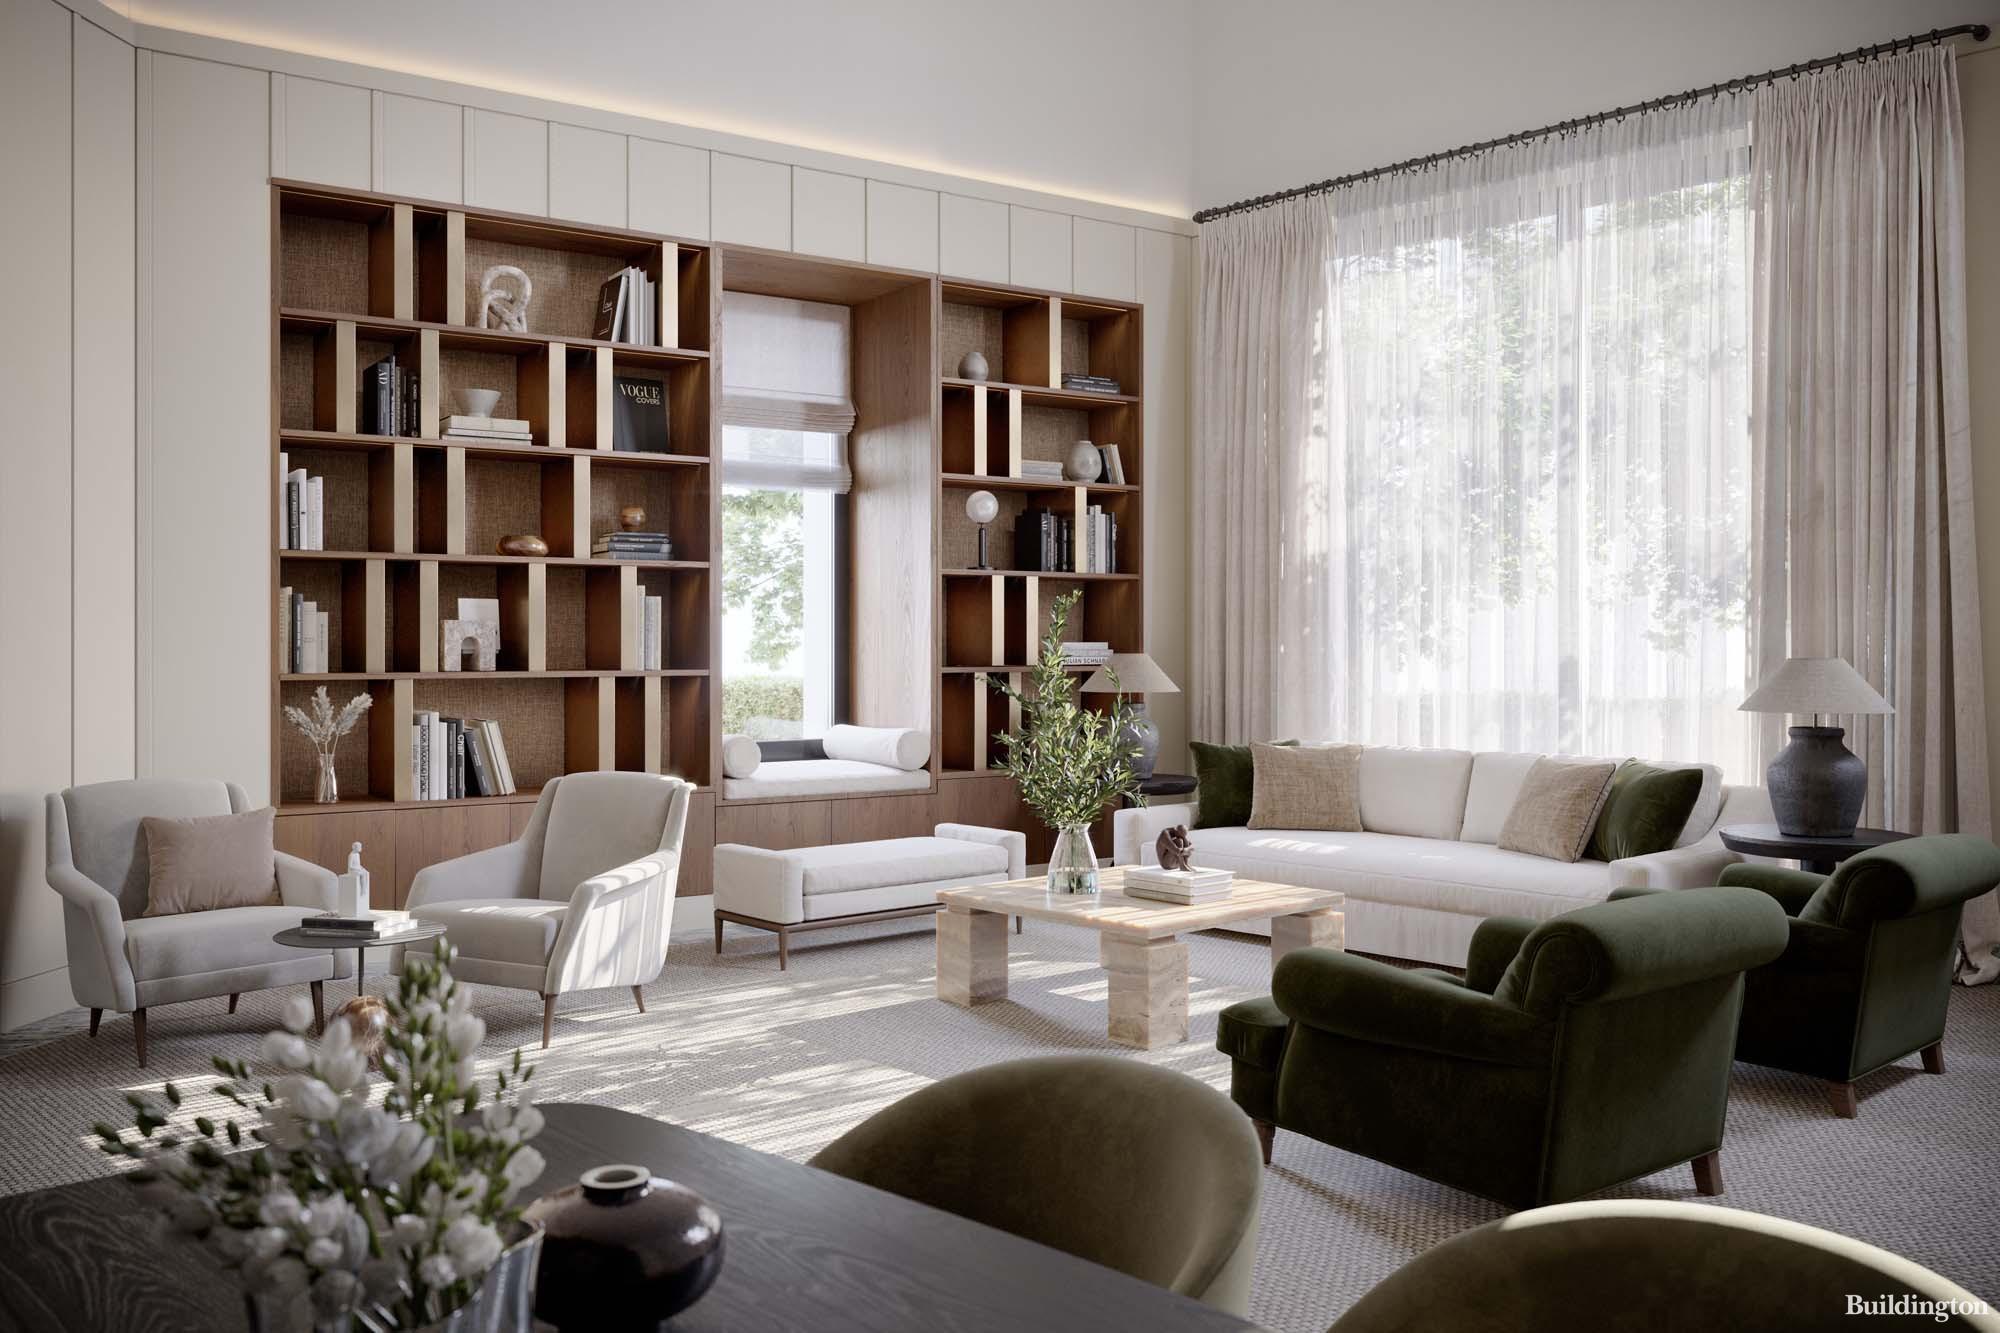 Fitzjohn's Club Lounge is designed by luxury design studio 1508 London.